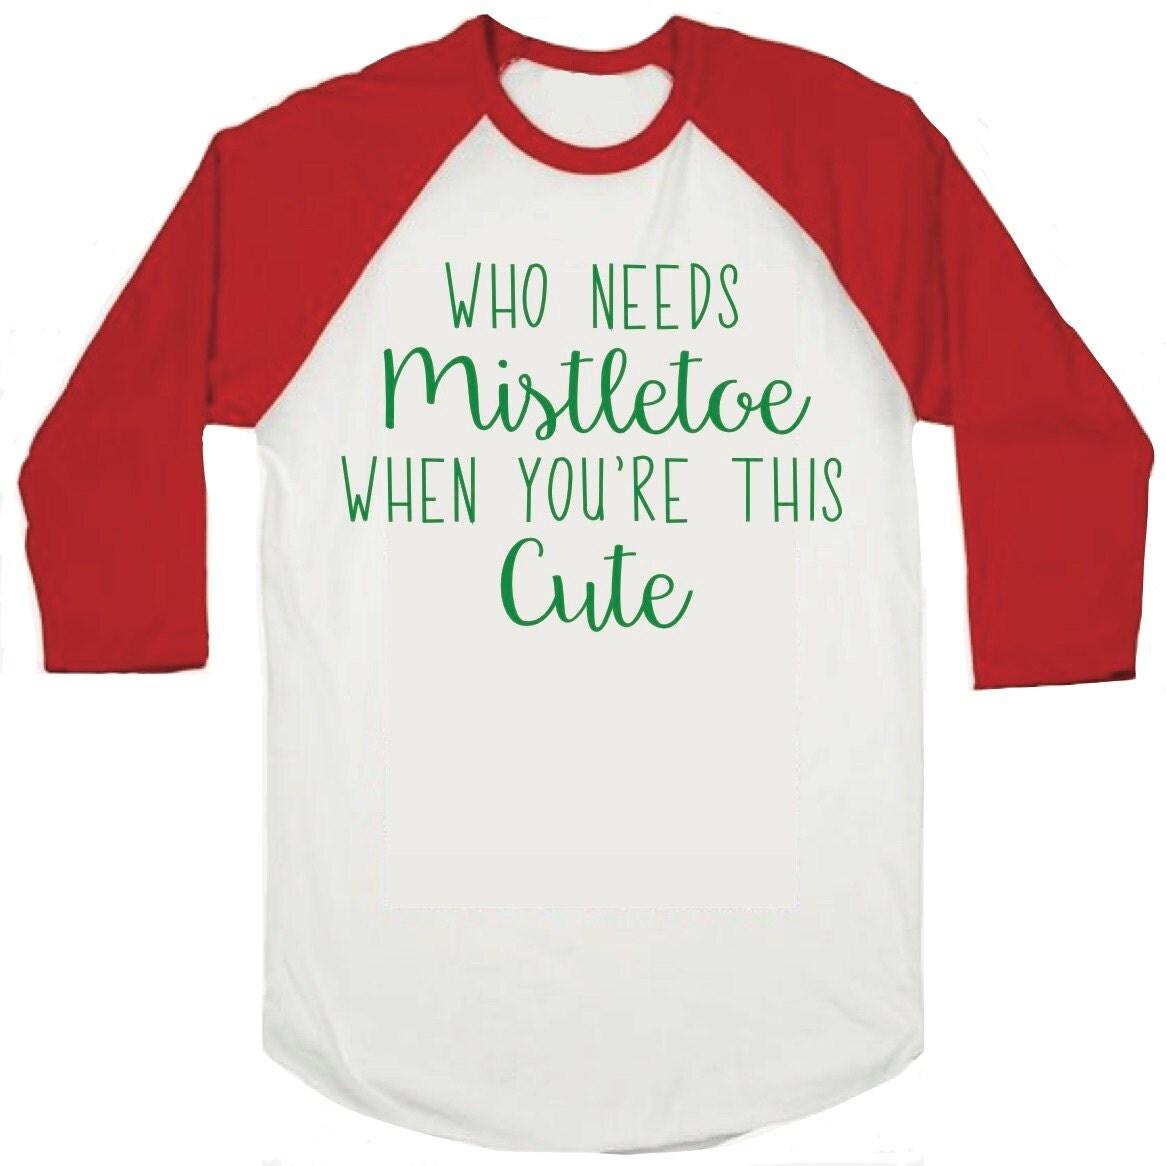 Kids Christmas Shirts Toddler Funny by BumpAndBeyondDesigns